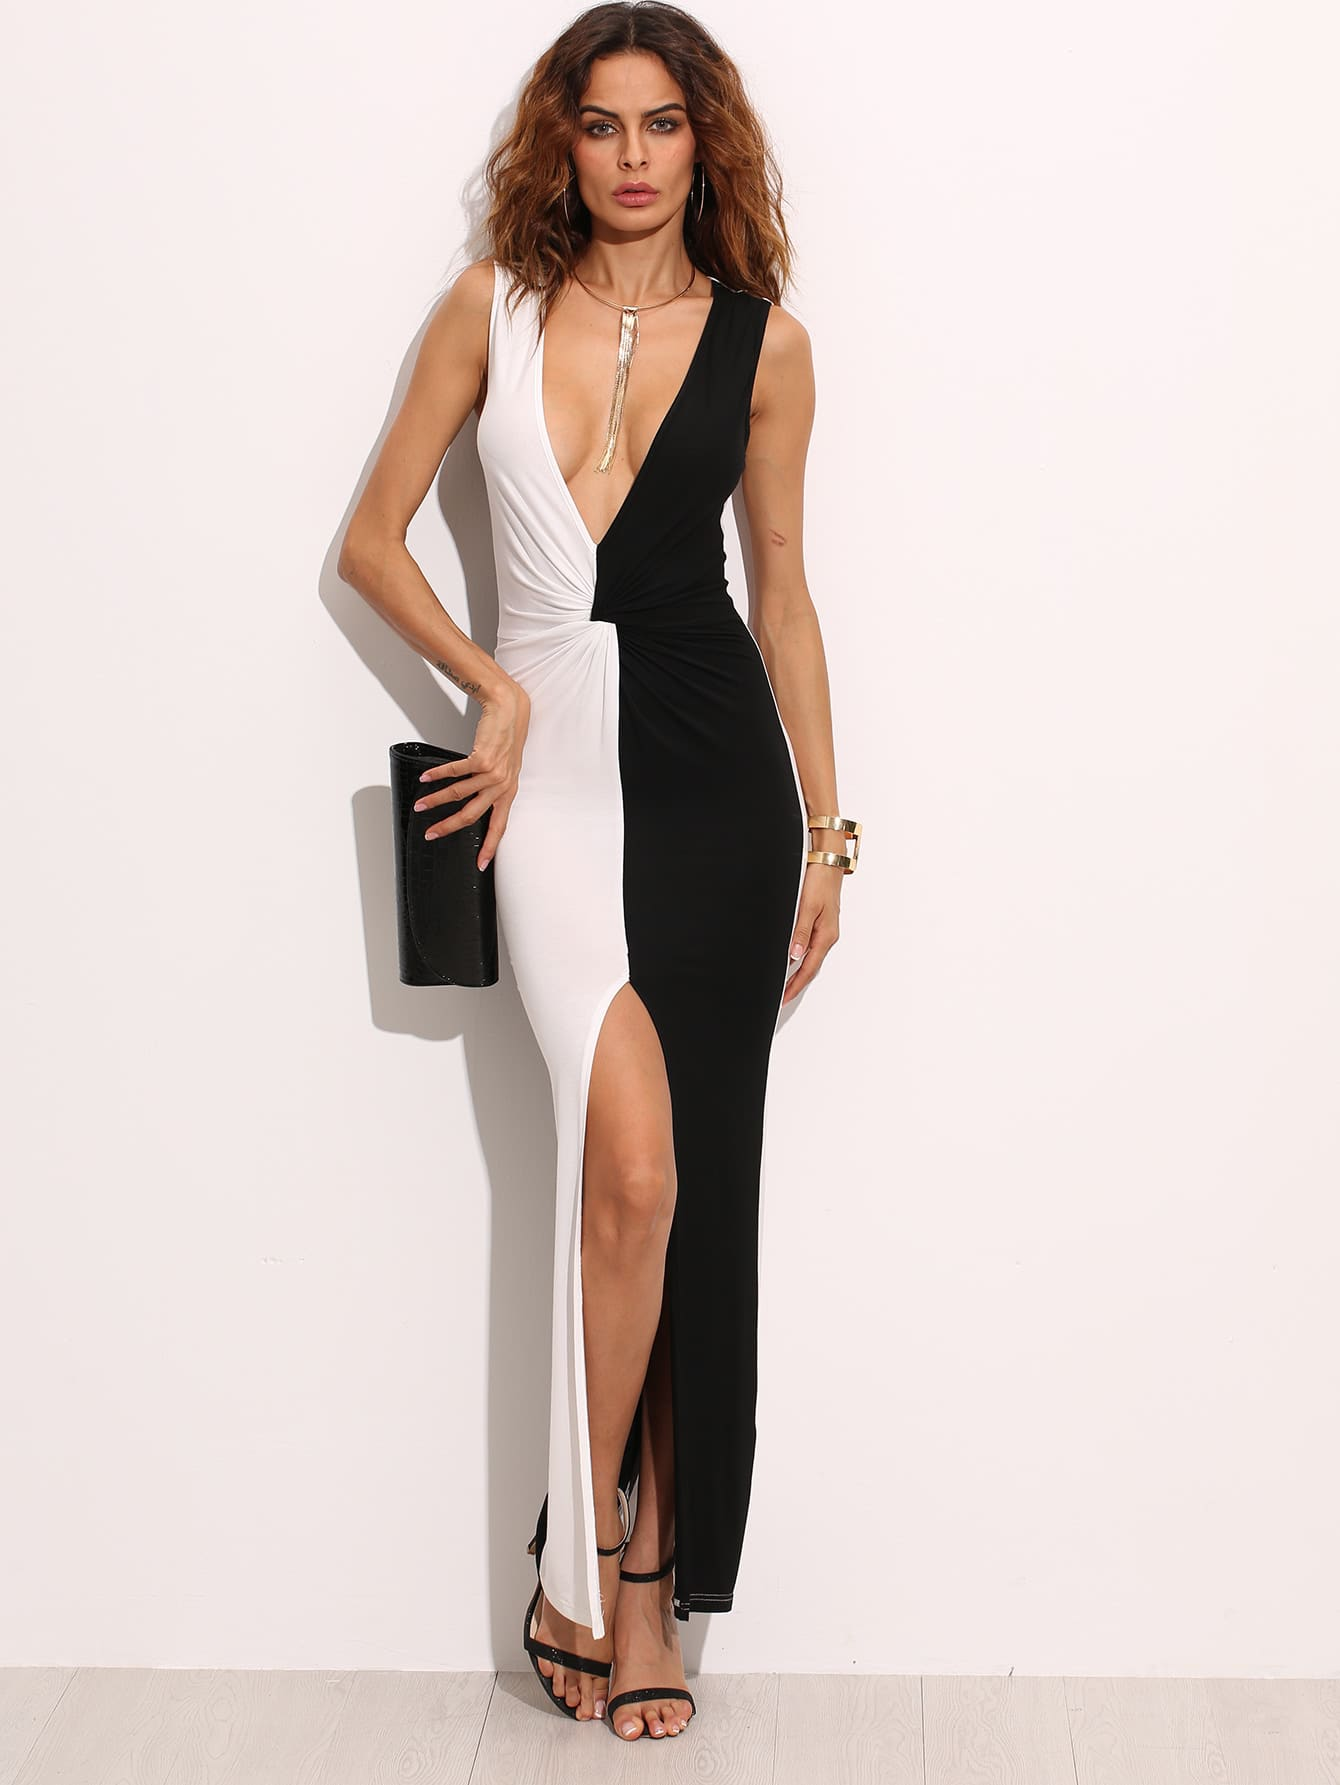 Two Tone Plunge Neckline Twist Front Slit Maxi Dress two tone letter print full length dress